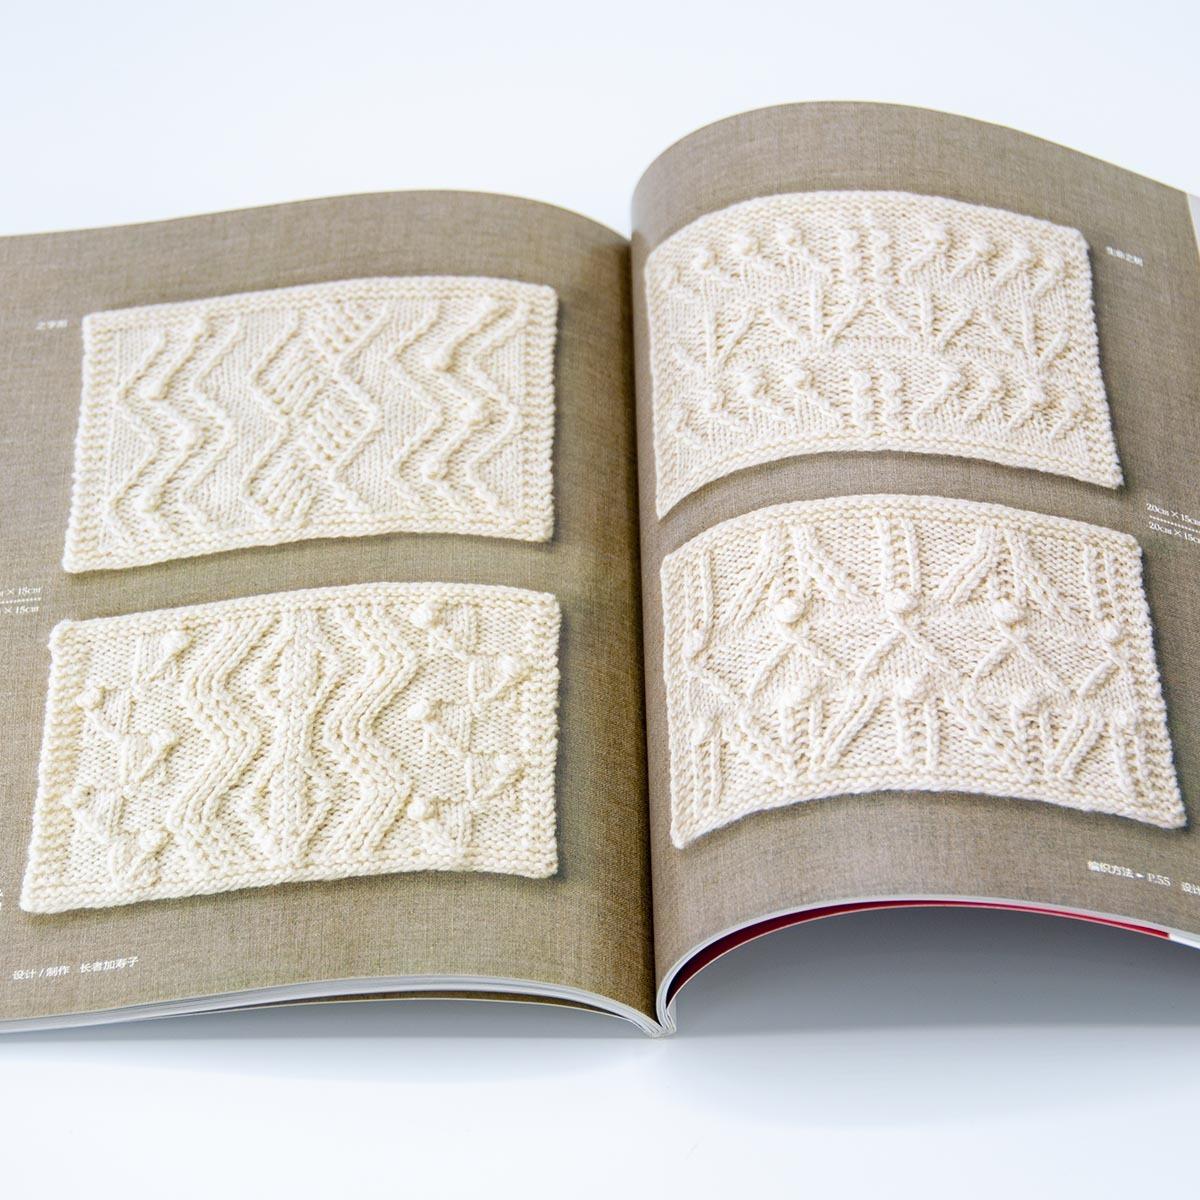 Книга 100 мотивов Northern Europe